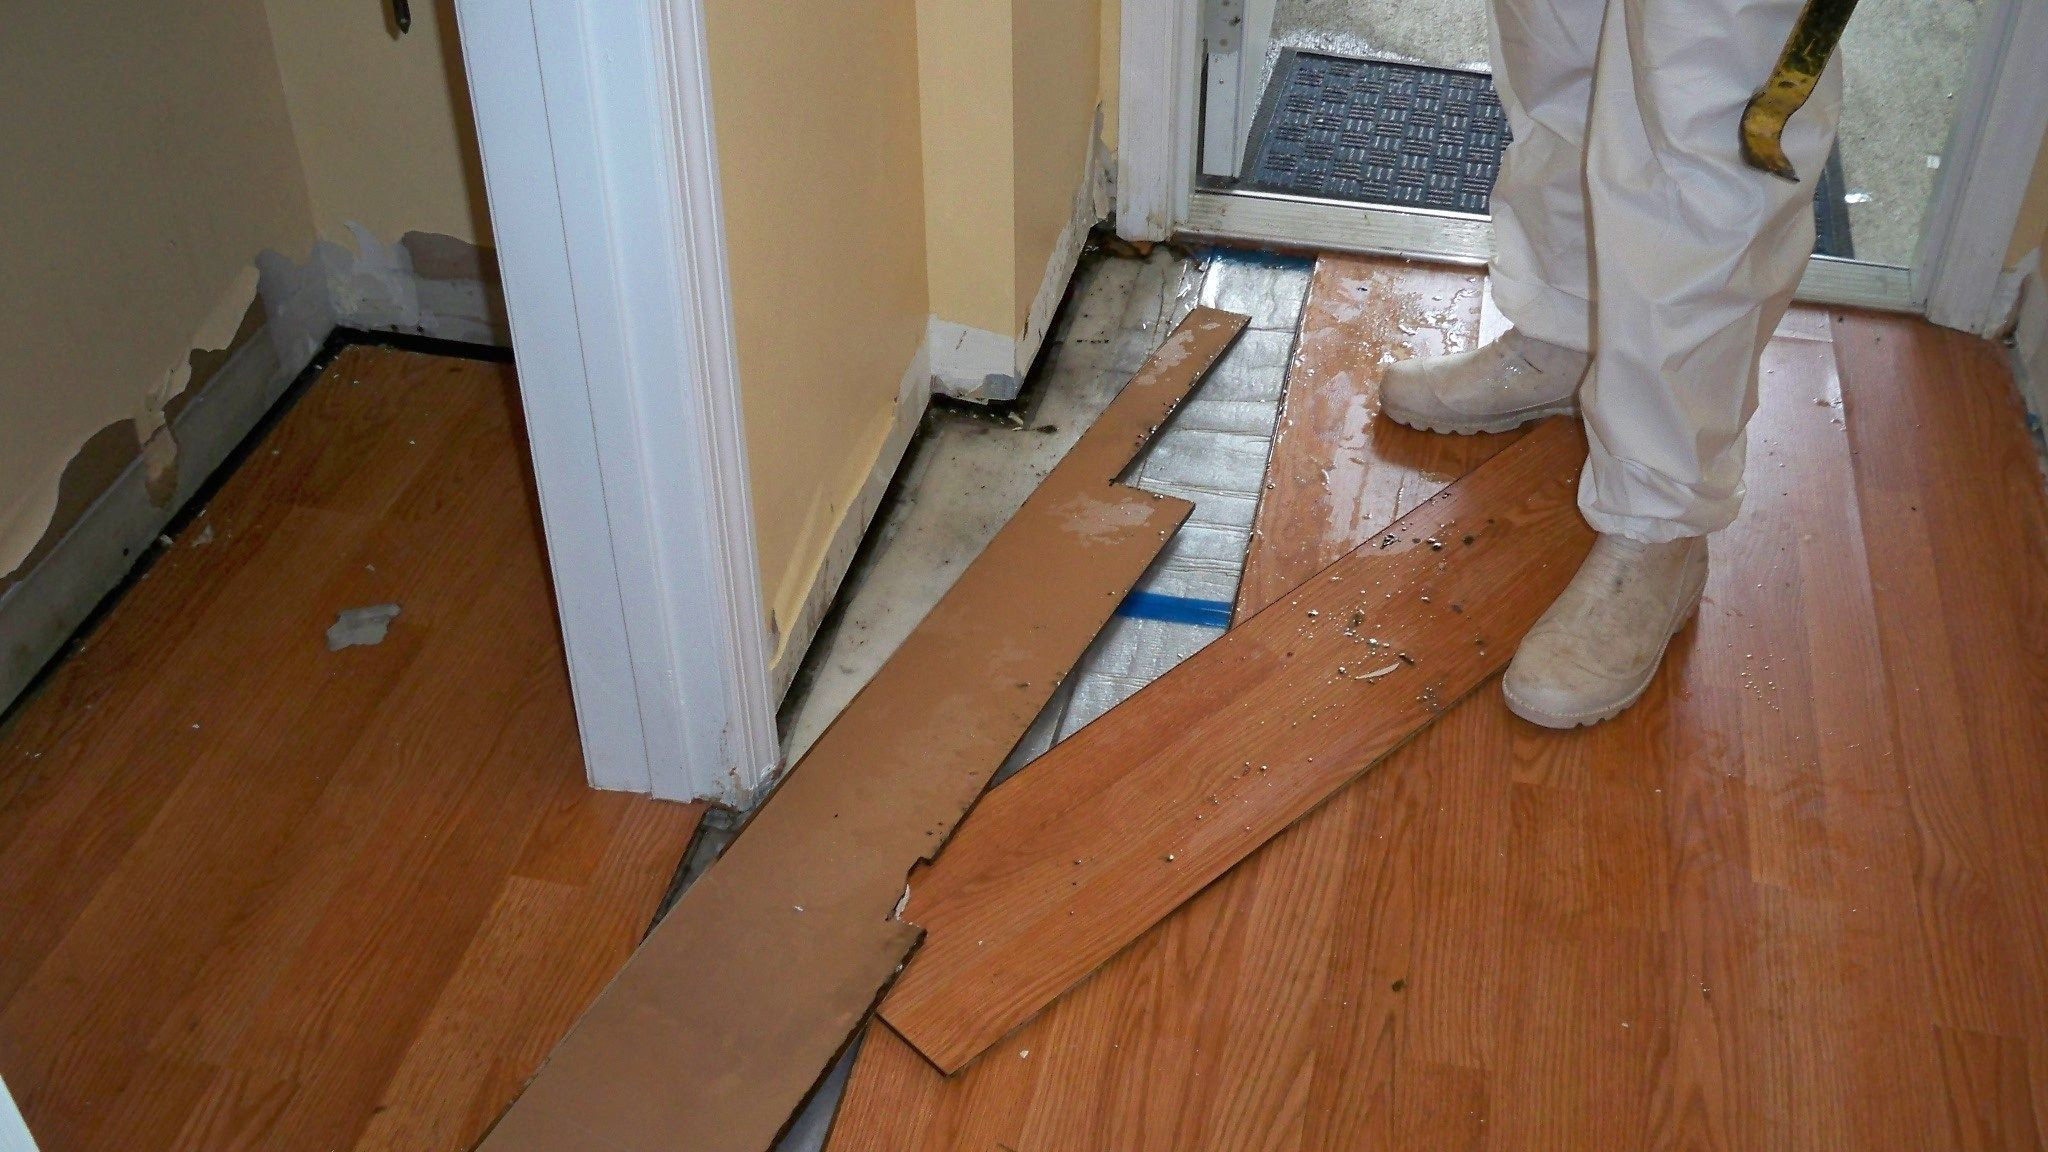 lowes parquet hardwood flooring of how much is laminate wood flooring floor plan ideas throughout how much is laminate wood flooring laminate wood flooring lowes laminate flooring installation cost uk